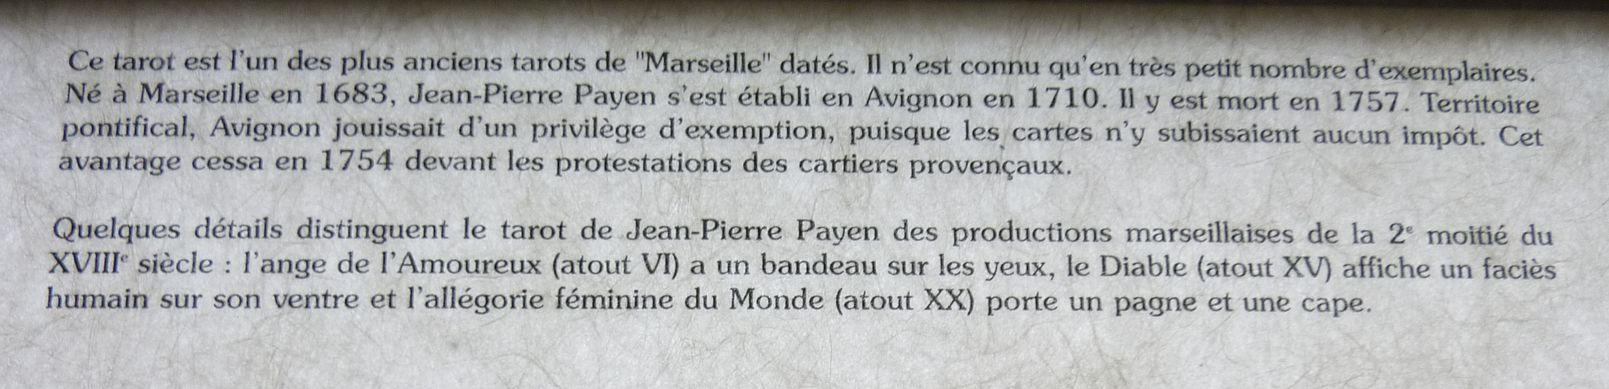 http://mapage.noos.fr/pic-vert/forum/payen1713issy3.jpg